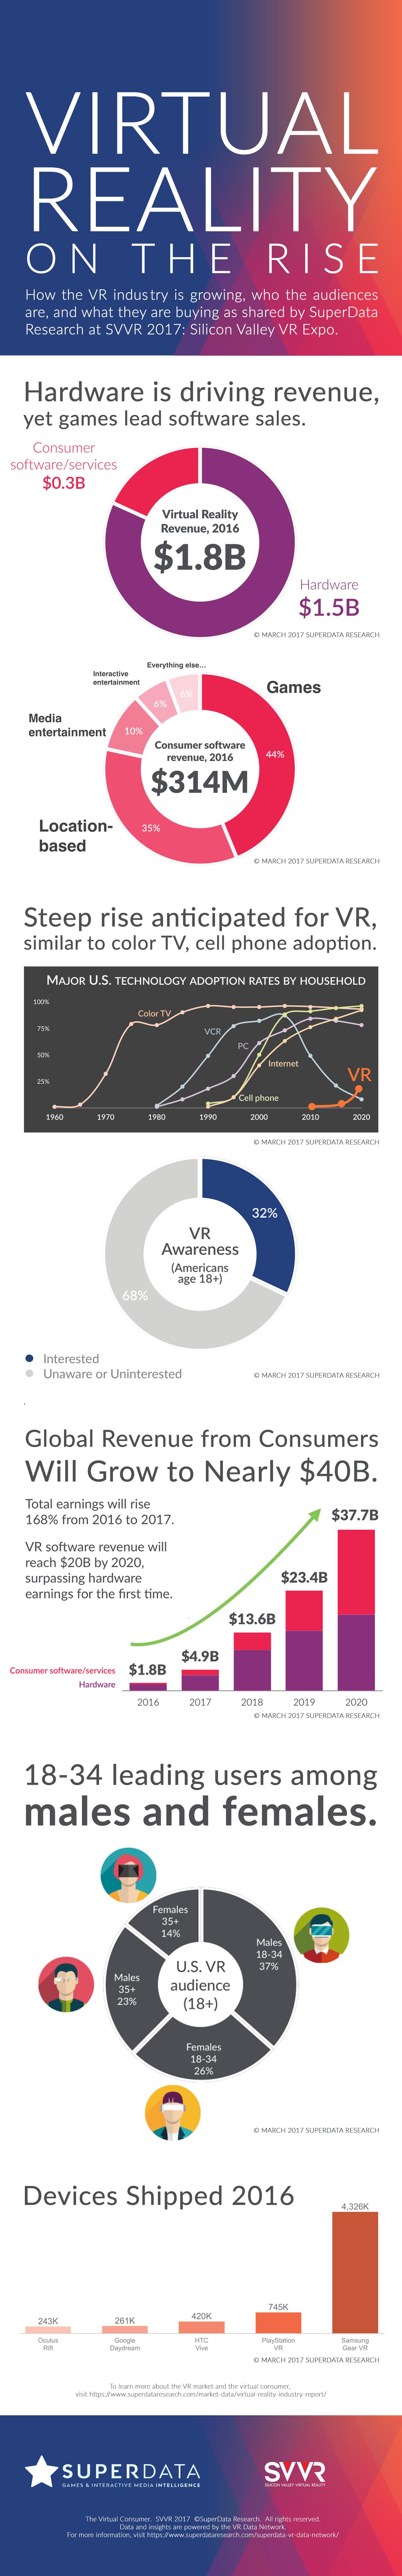 superdata VR infographic